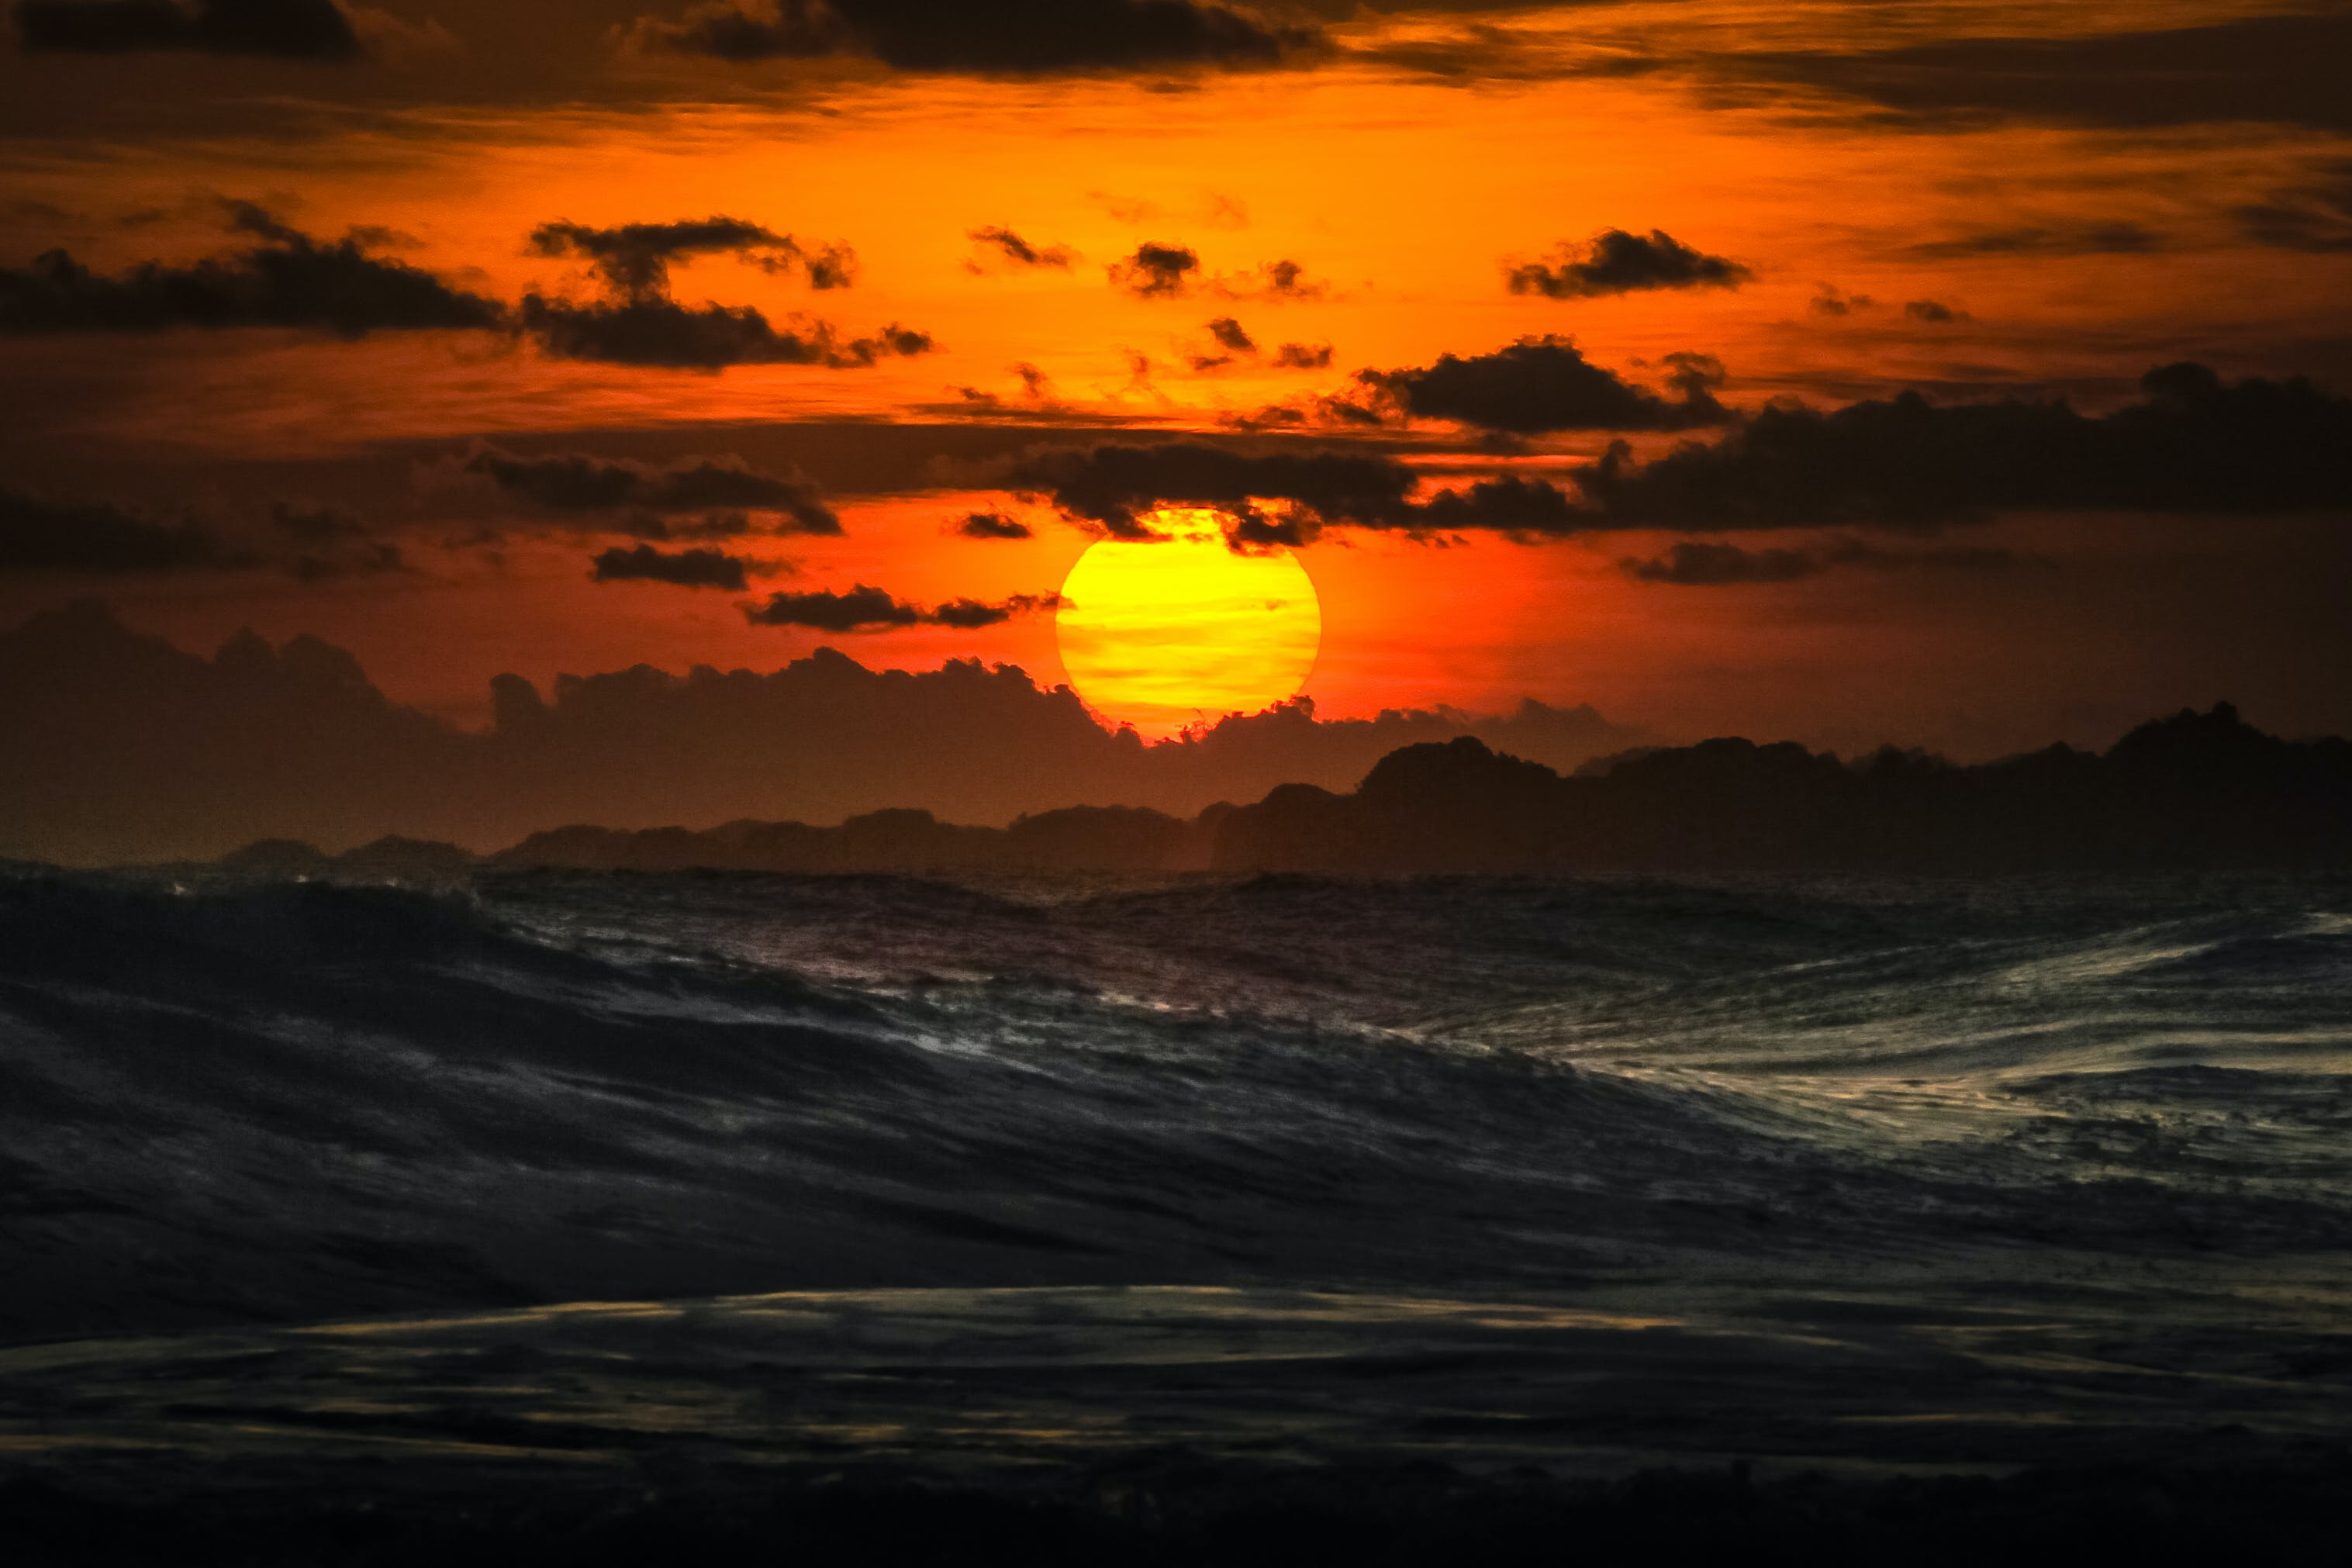 Free stock photo of beach, golden hour, golden sunset, landscape